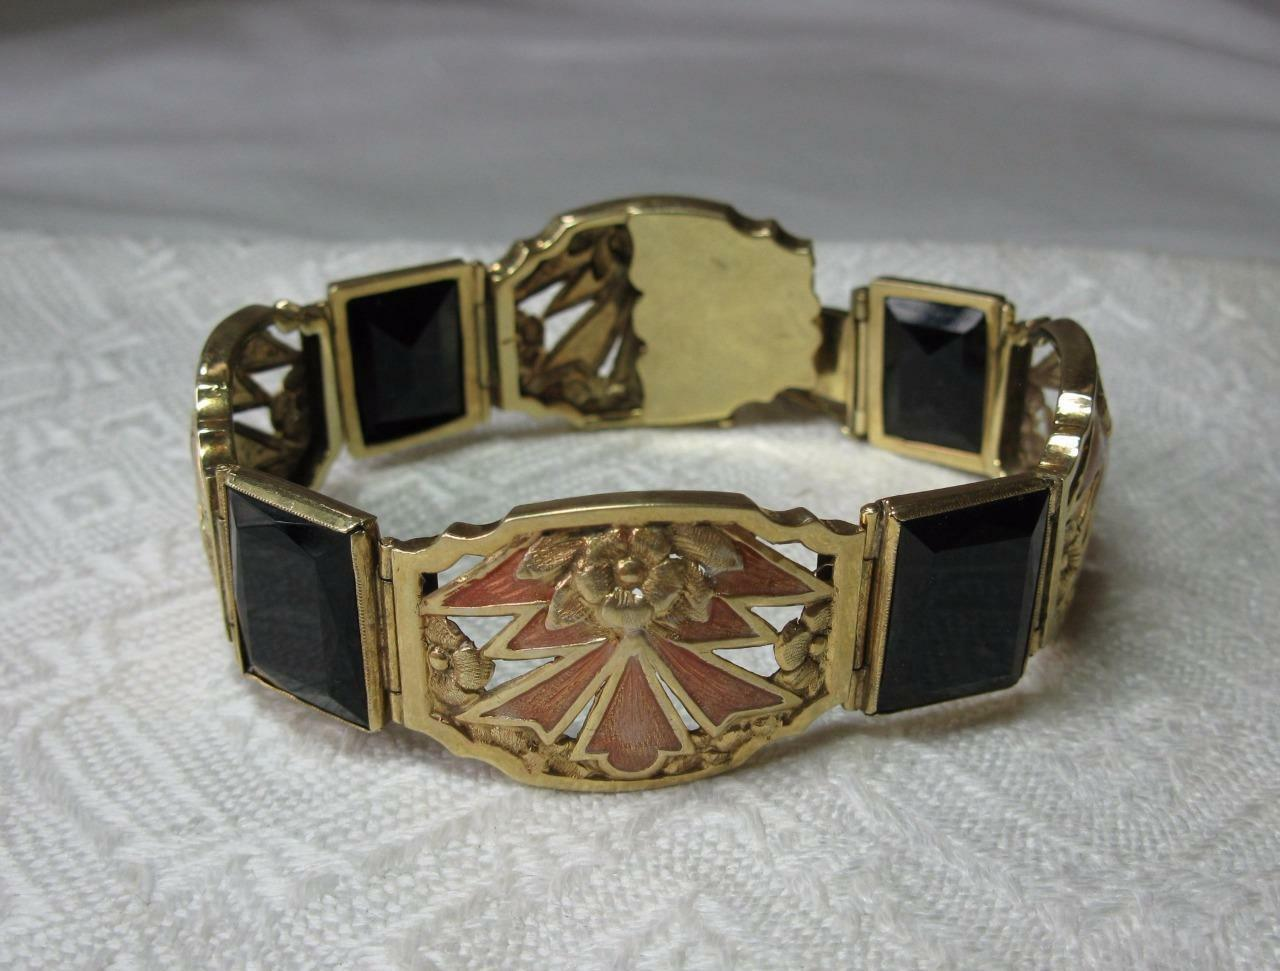 Art Nouveau Bracciale 14k oro Smalto Onice Onice Onice Nera Belle Epoque Museum Qualità Raro bb94a4